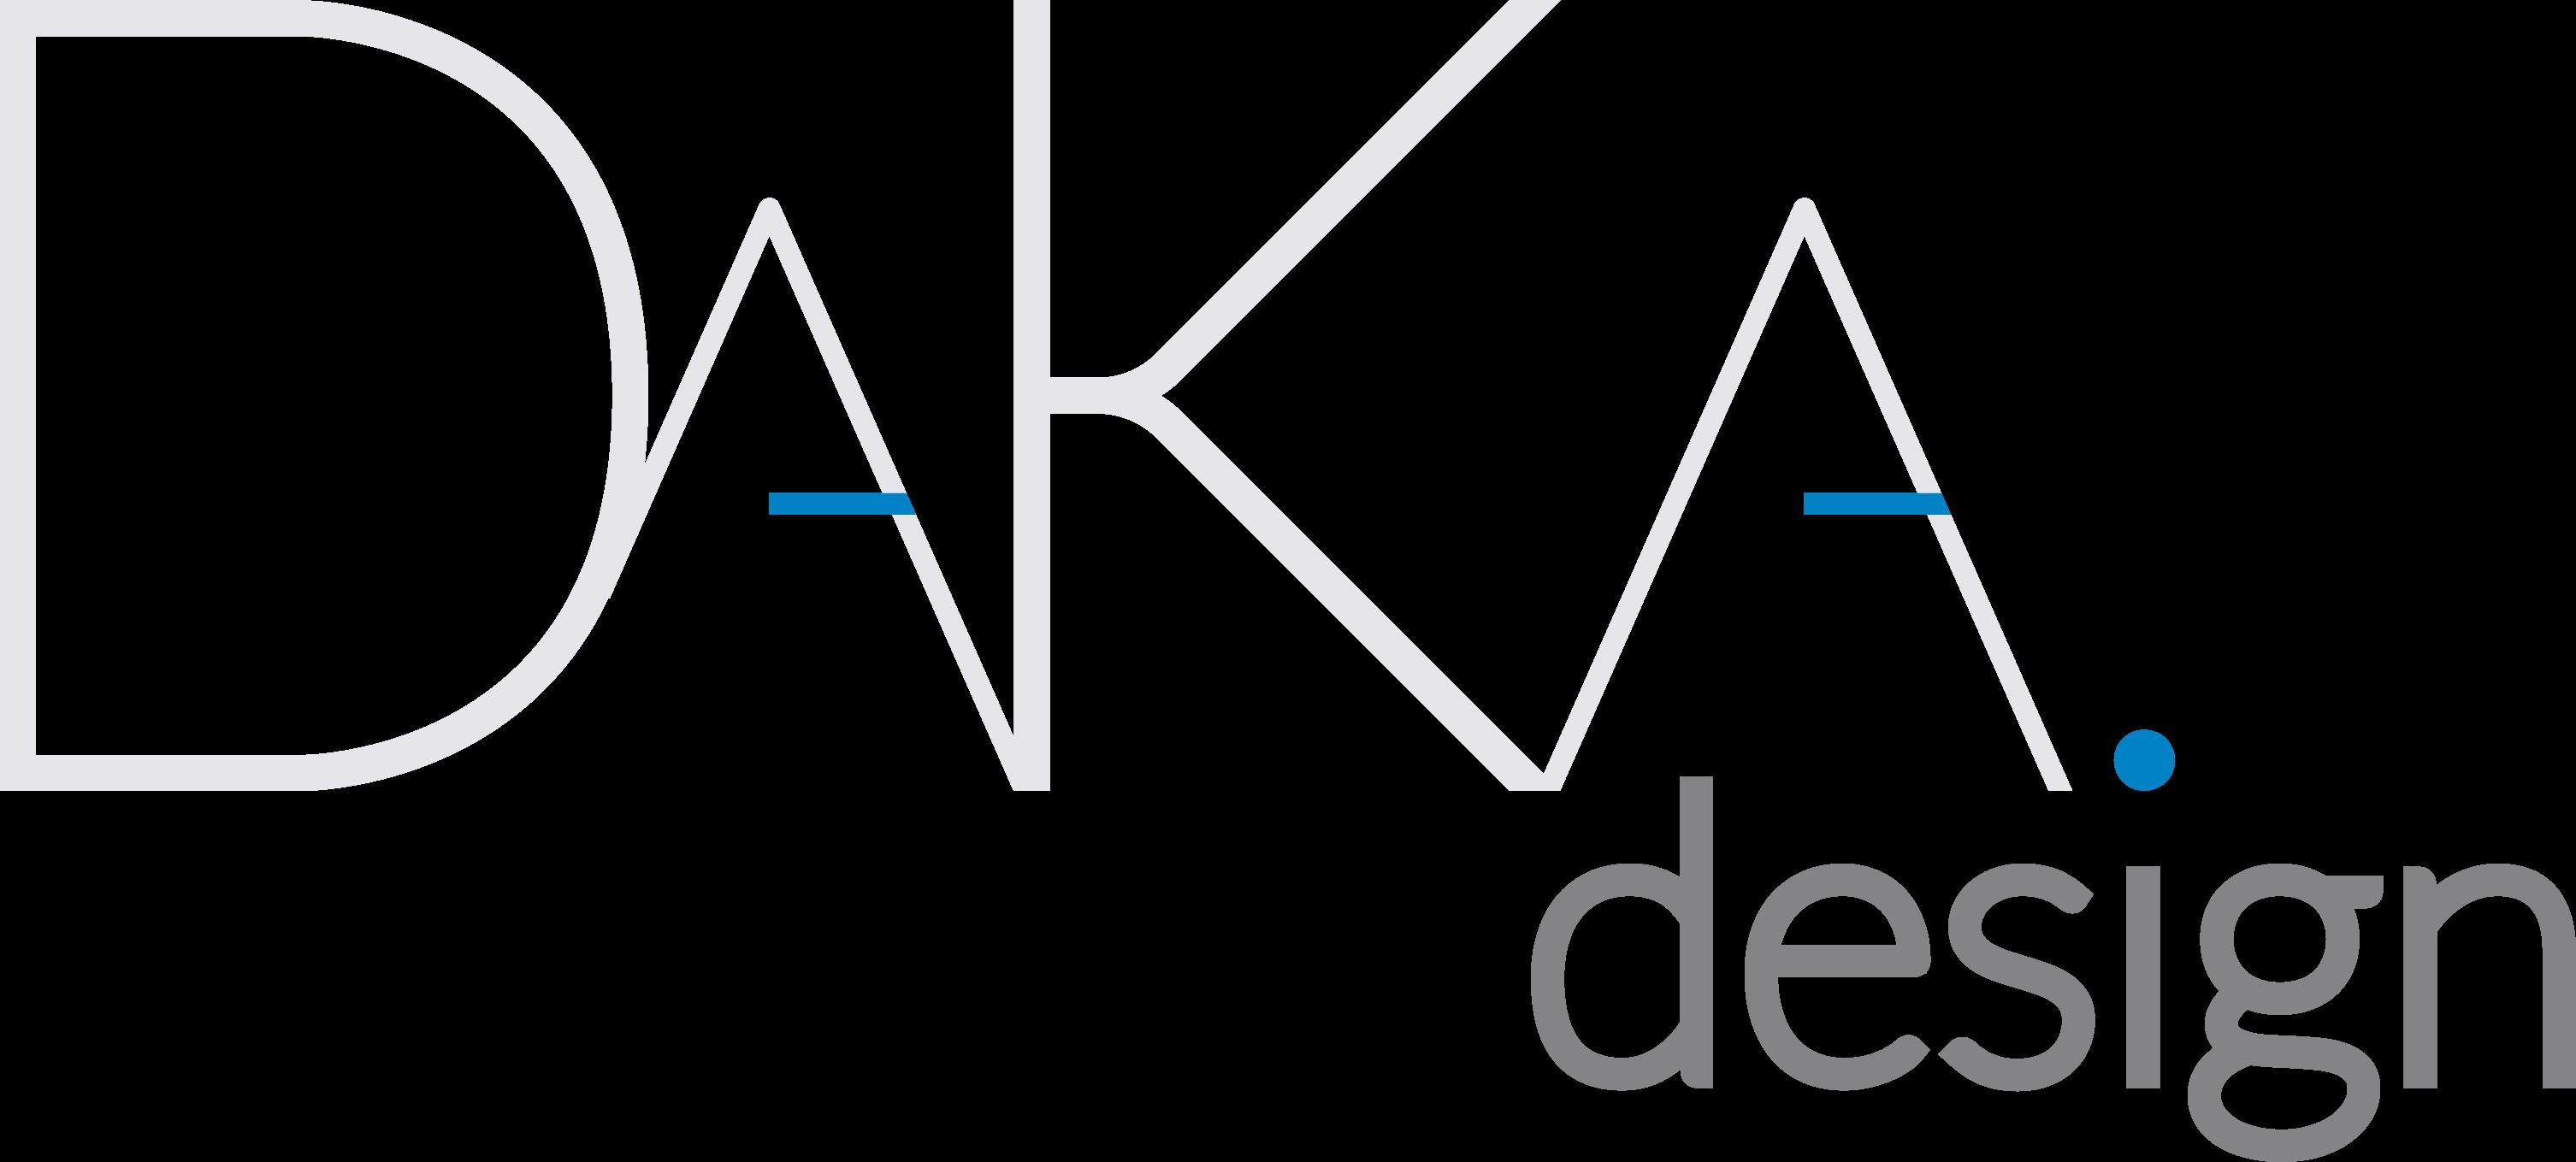 Datenschutz – DaKa.design